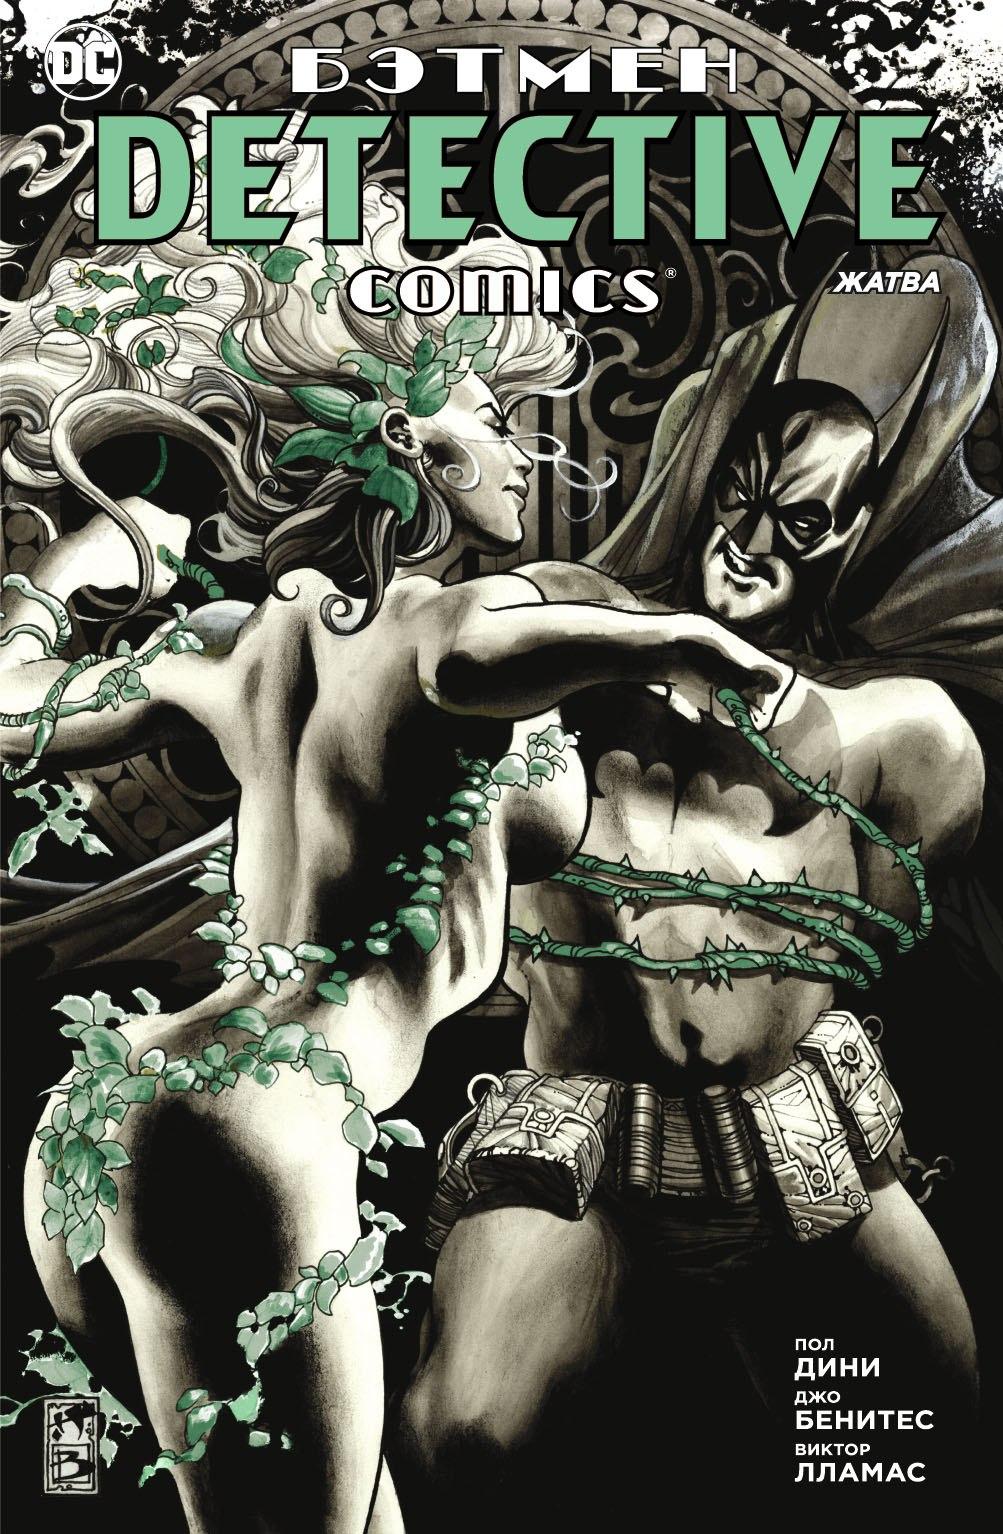 Комикс «Бэтмен. Detective Comics. Жатва» (2006)